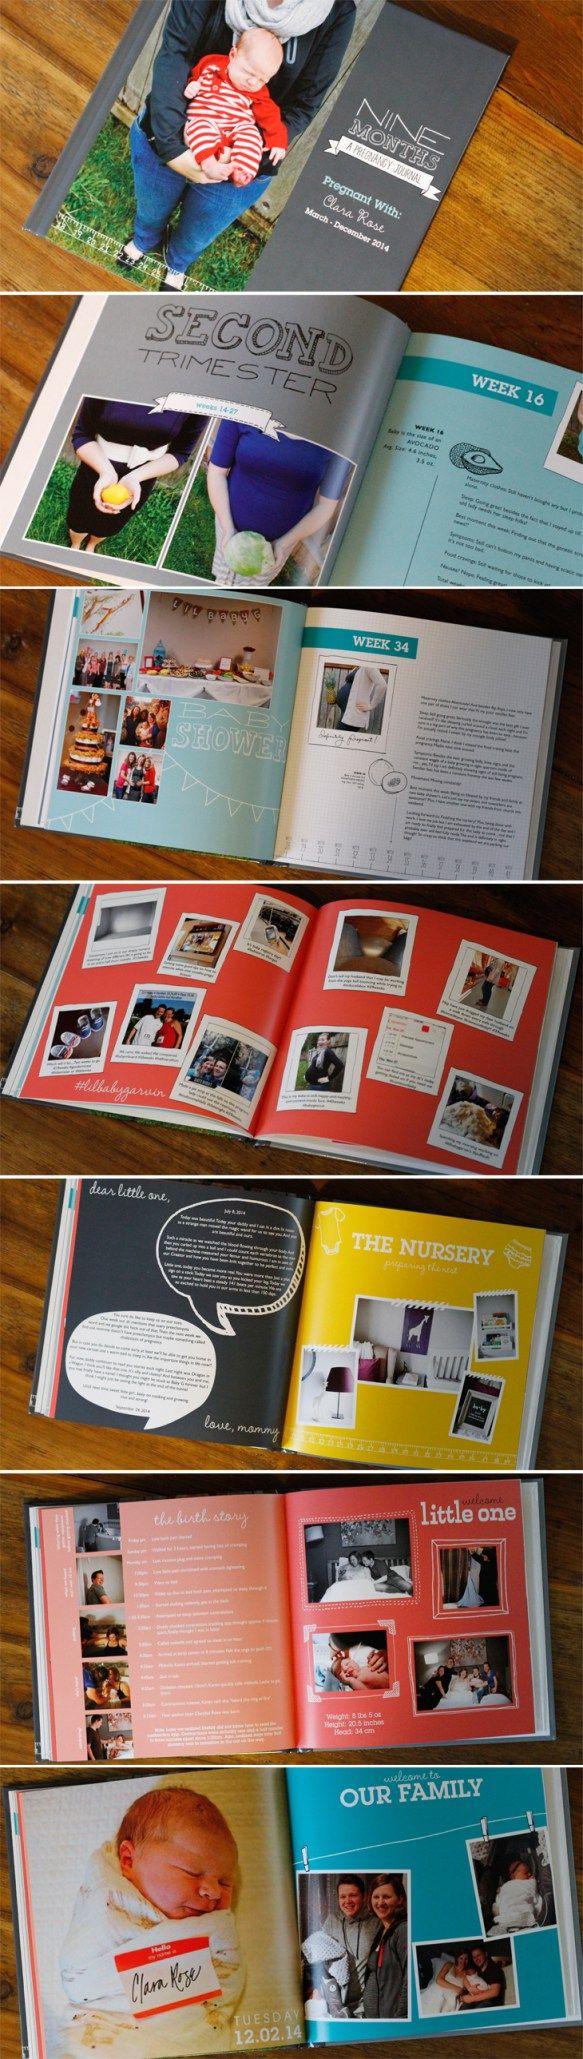 Pregnancy scrapbook ideas journaling - A Pregnancy Journal